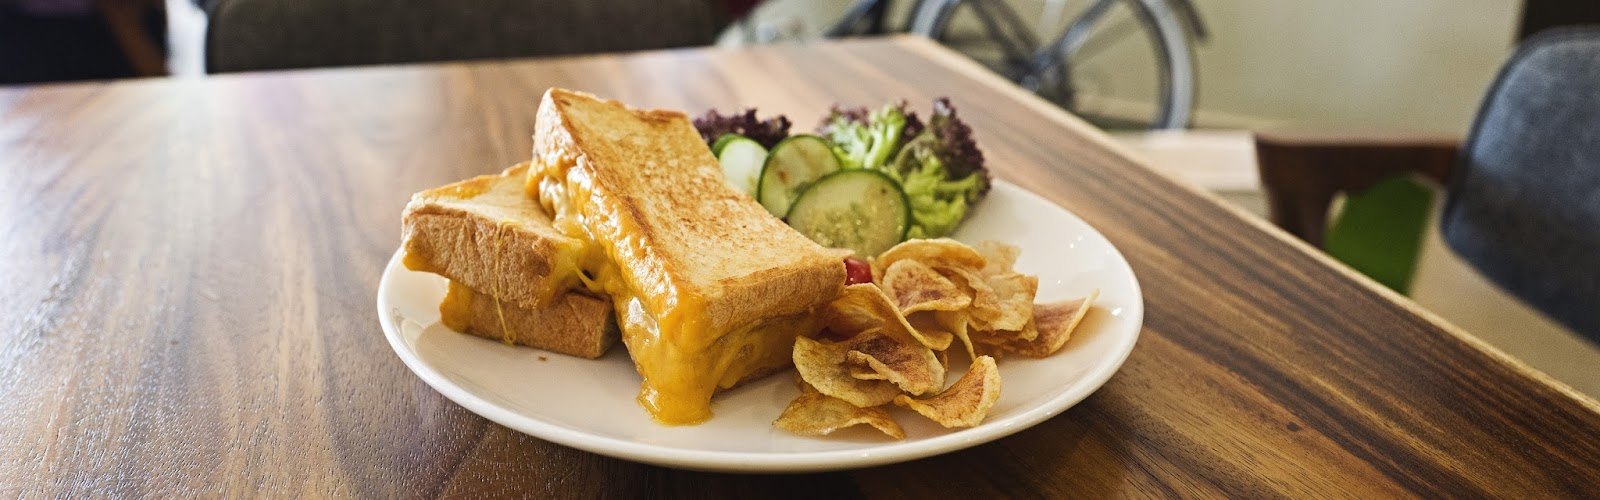 f-sandwich-L1050921.jpg